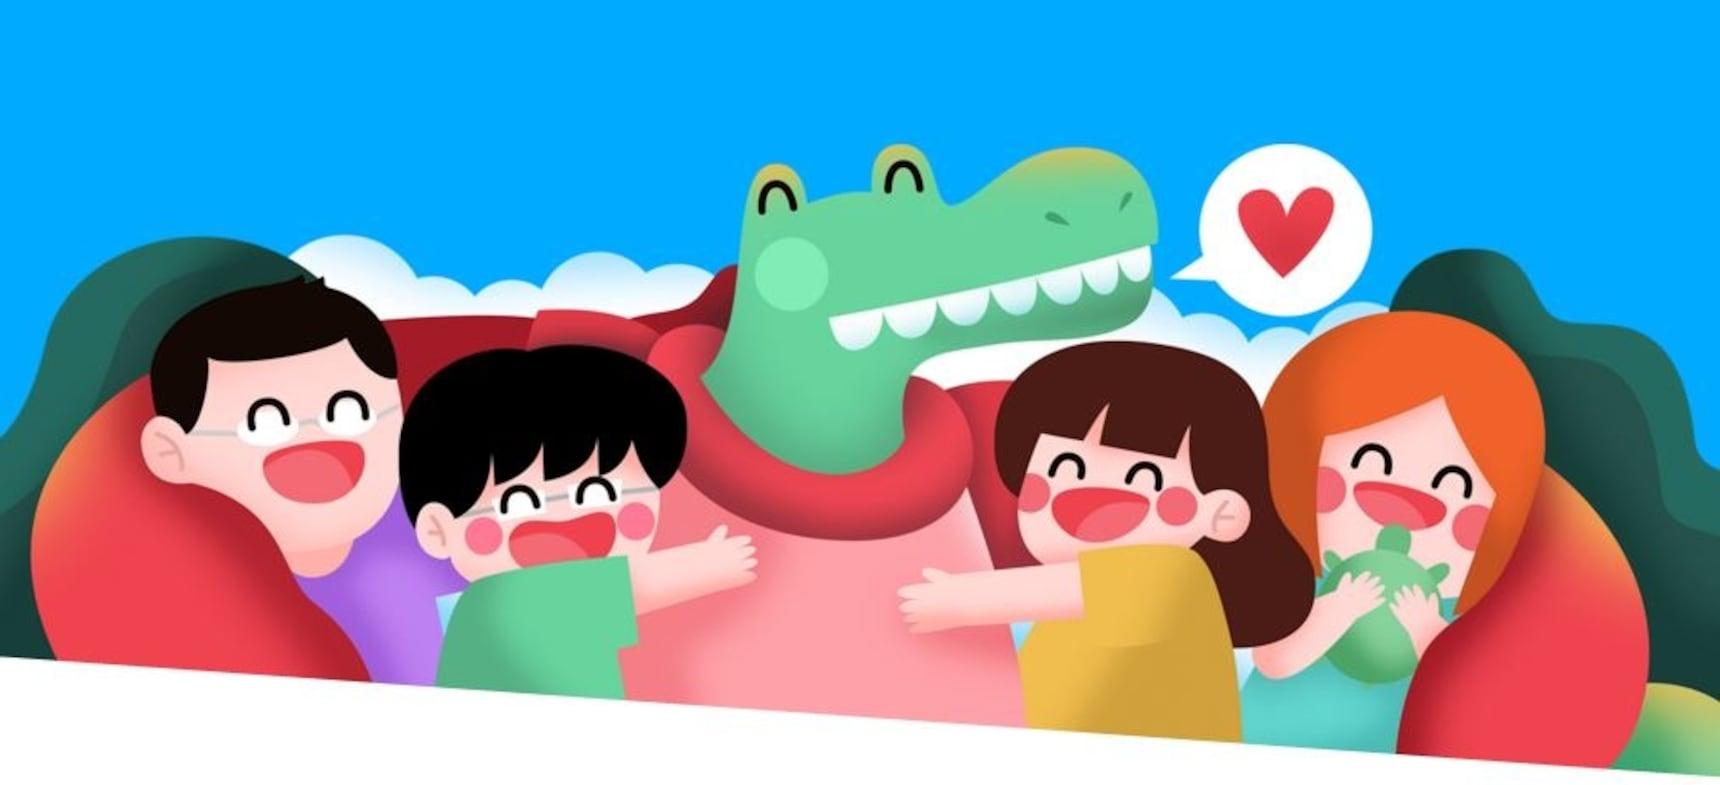 7 Reasons to Love WaniKani for Kanji